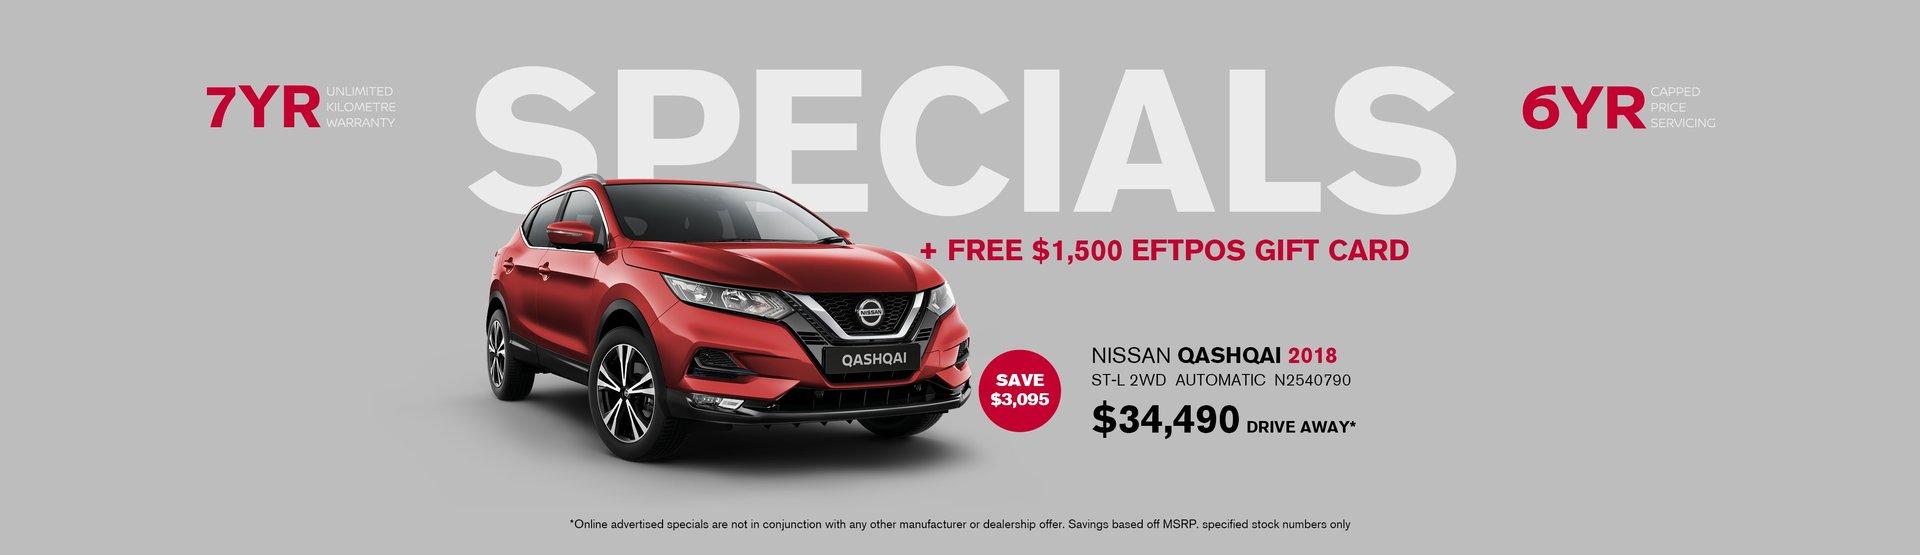 Nissan Qashqai special